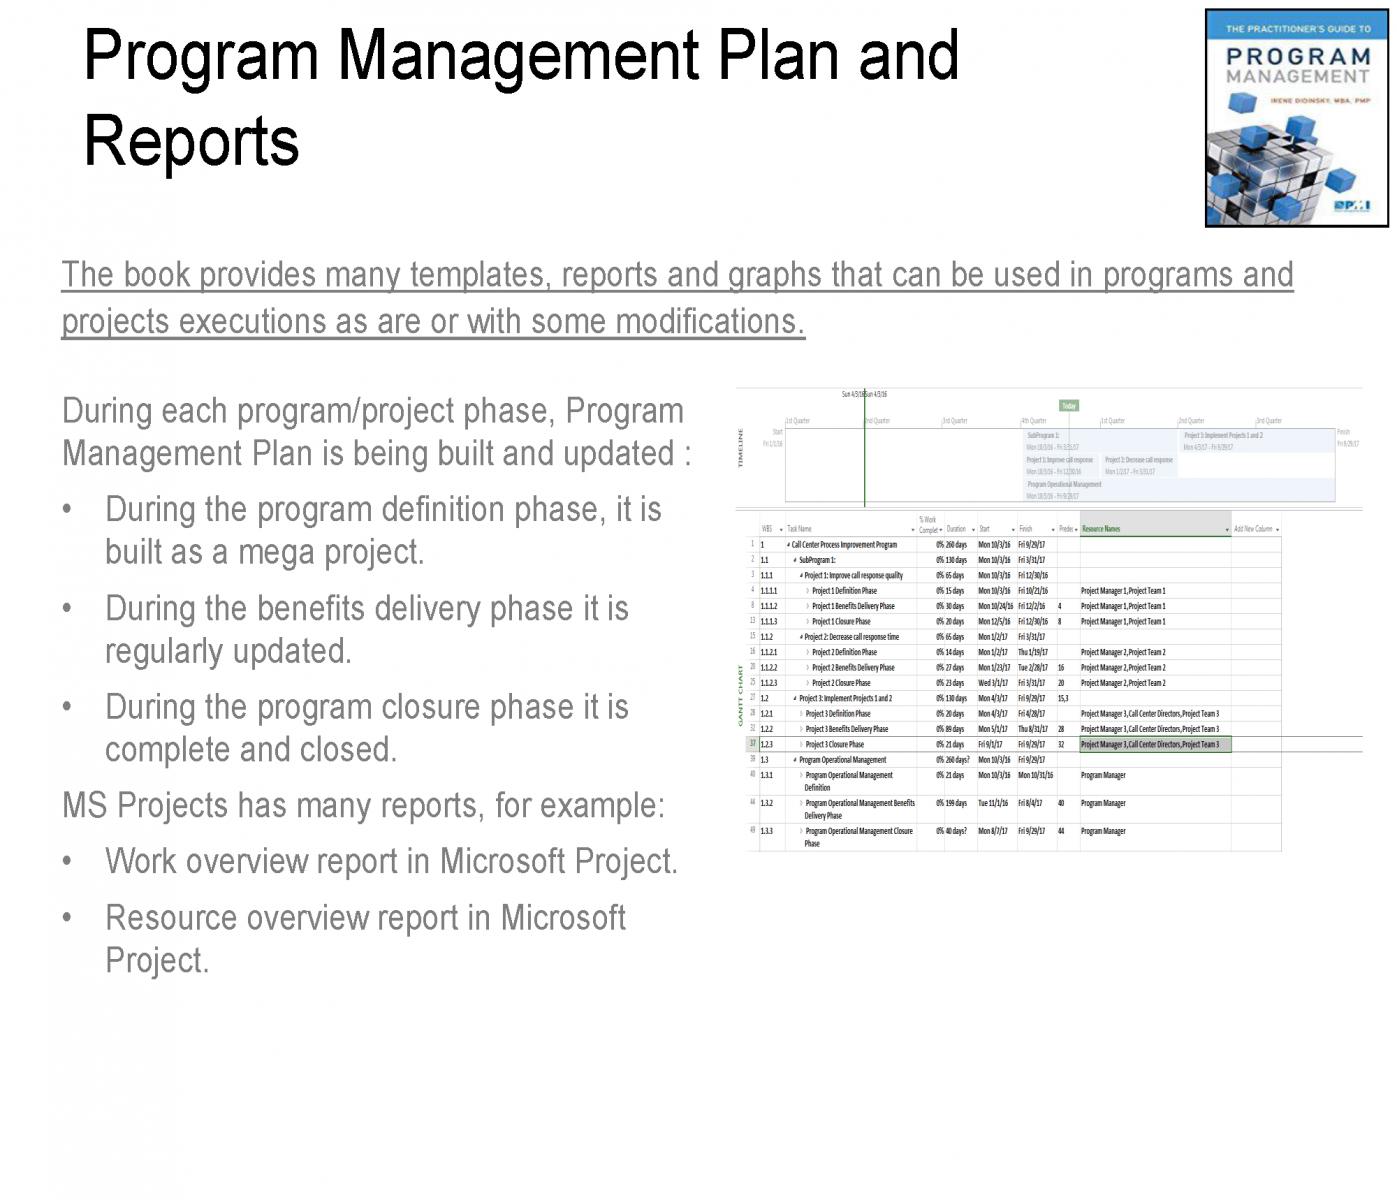 ProjectManagementcom webinar_Irene Didinsky_03282018_v01 (1)_Page_14